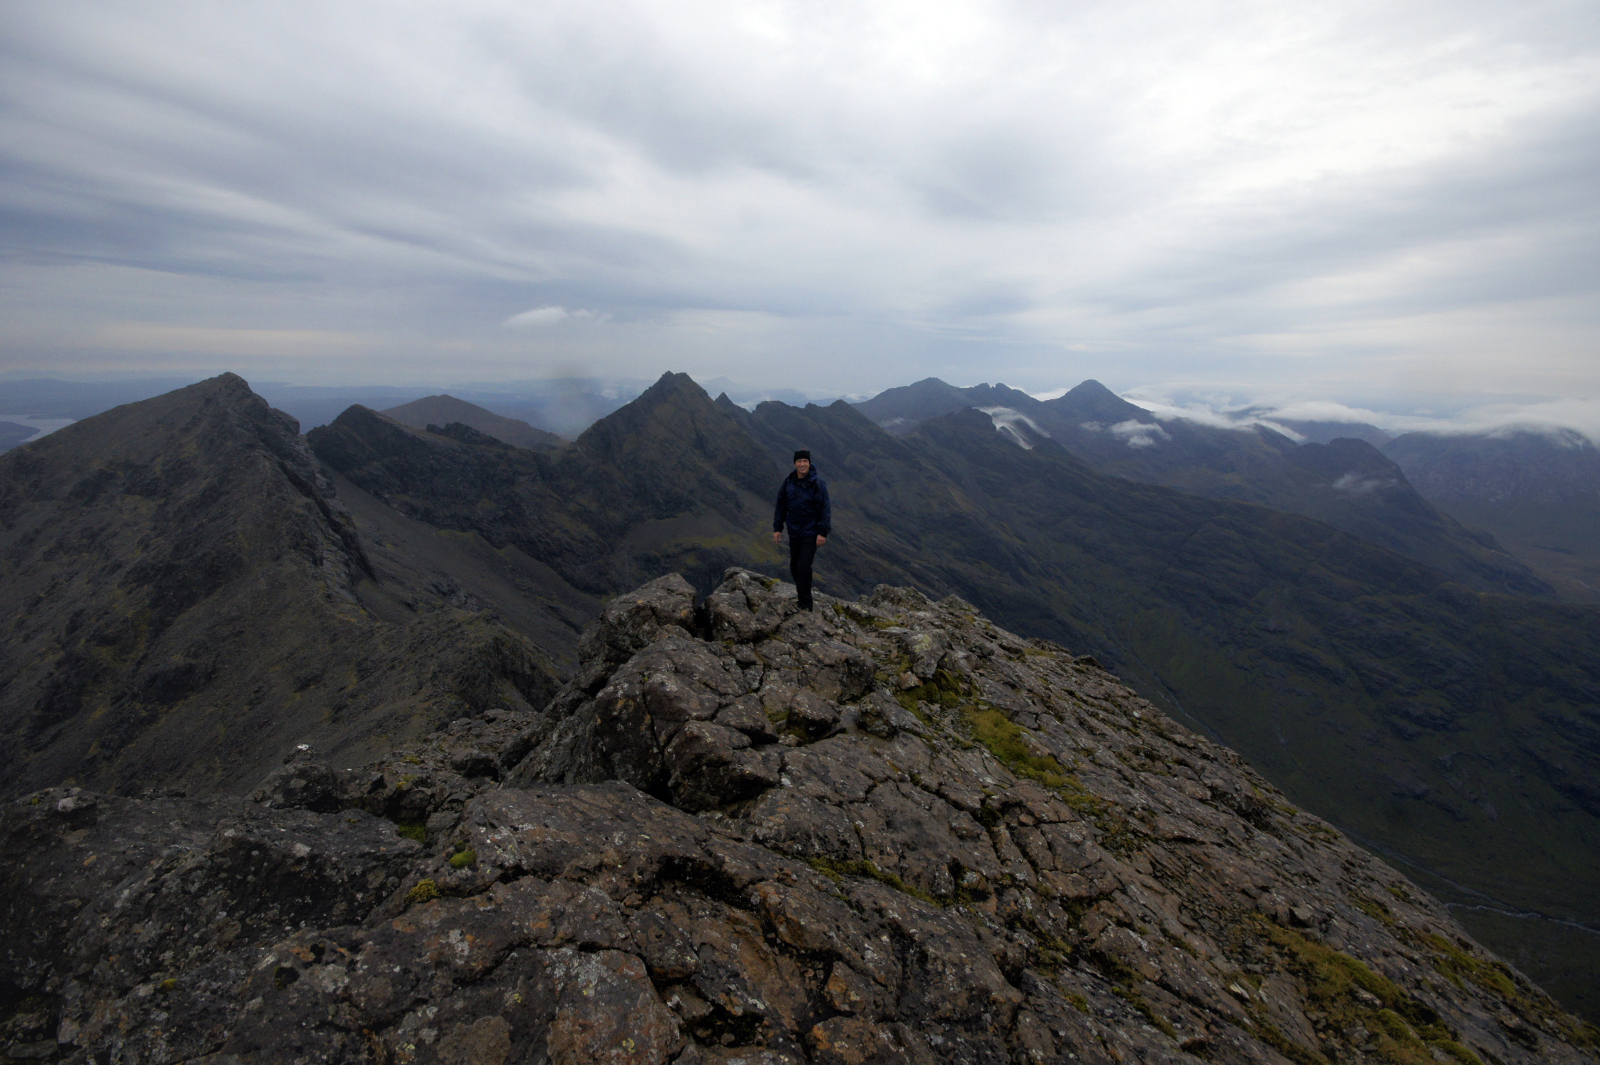 Kieran Rae Skye Black Cuillin Mountain Ridge Scotland Portrait